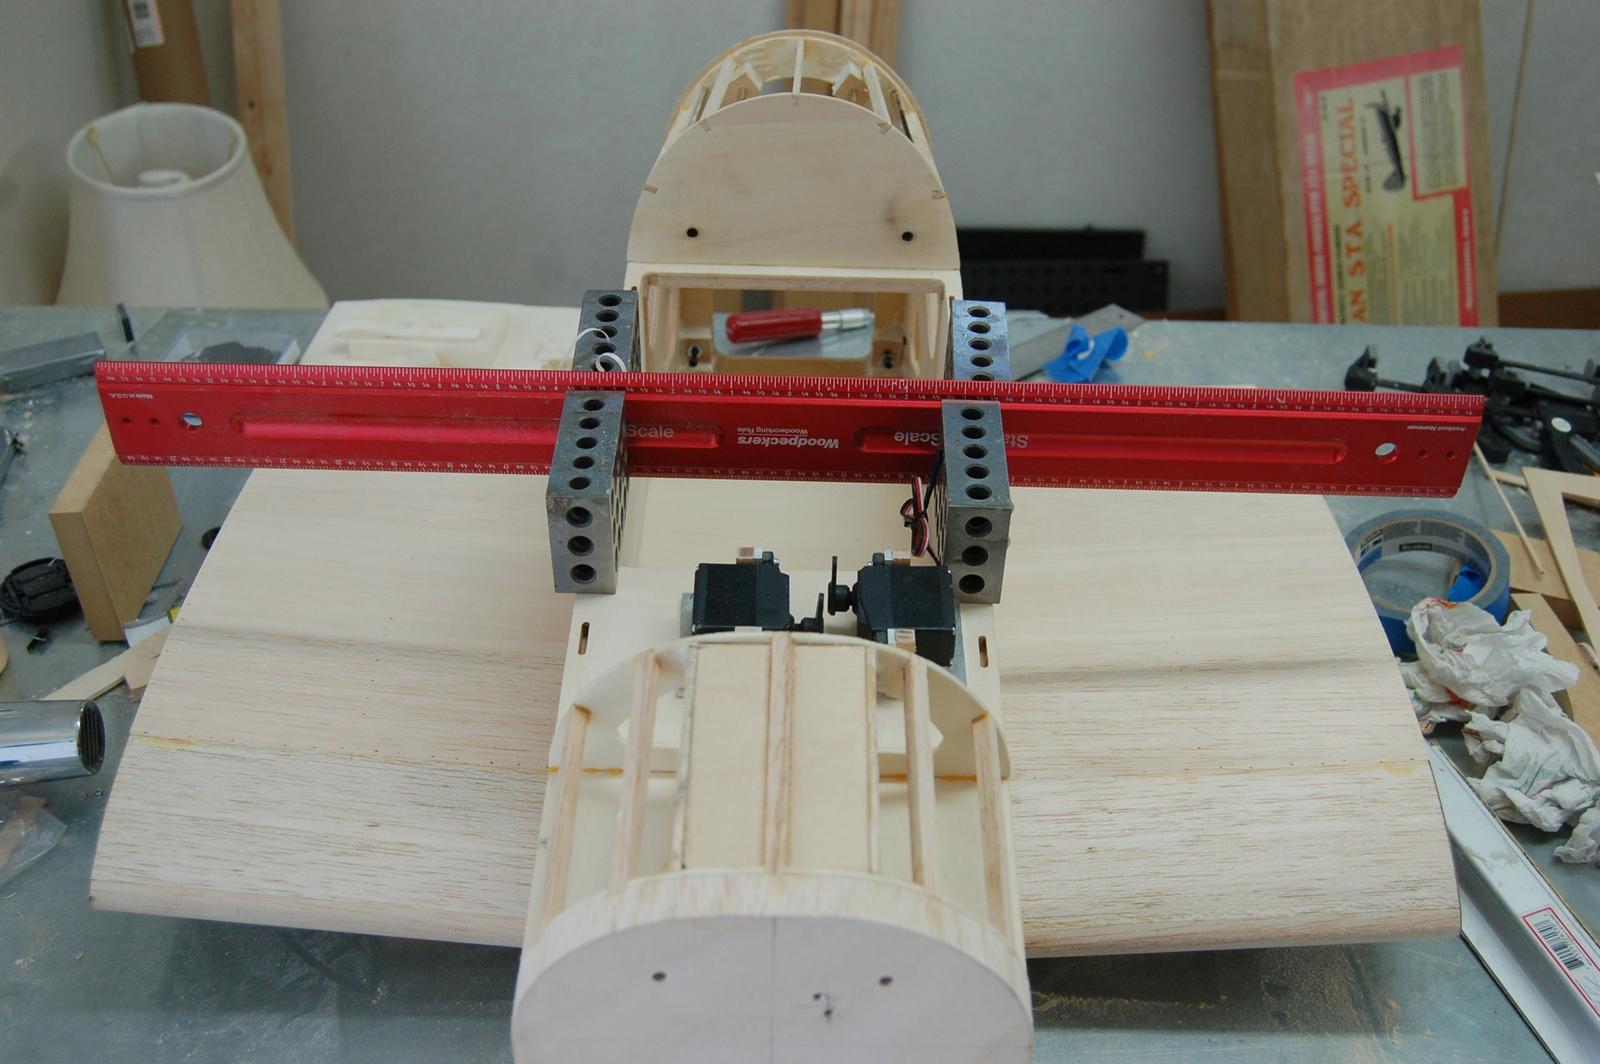 Click image for larger version  Name:m_Cockpit floor 57 010.jpg Views:69 Size:1,019.1 KB ID:2009530